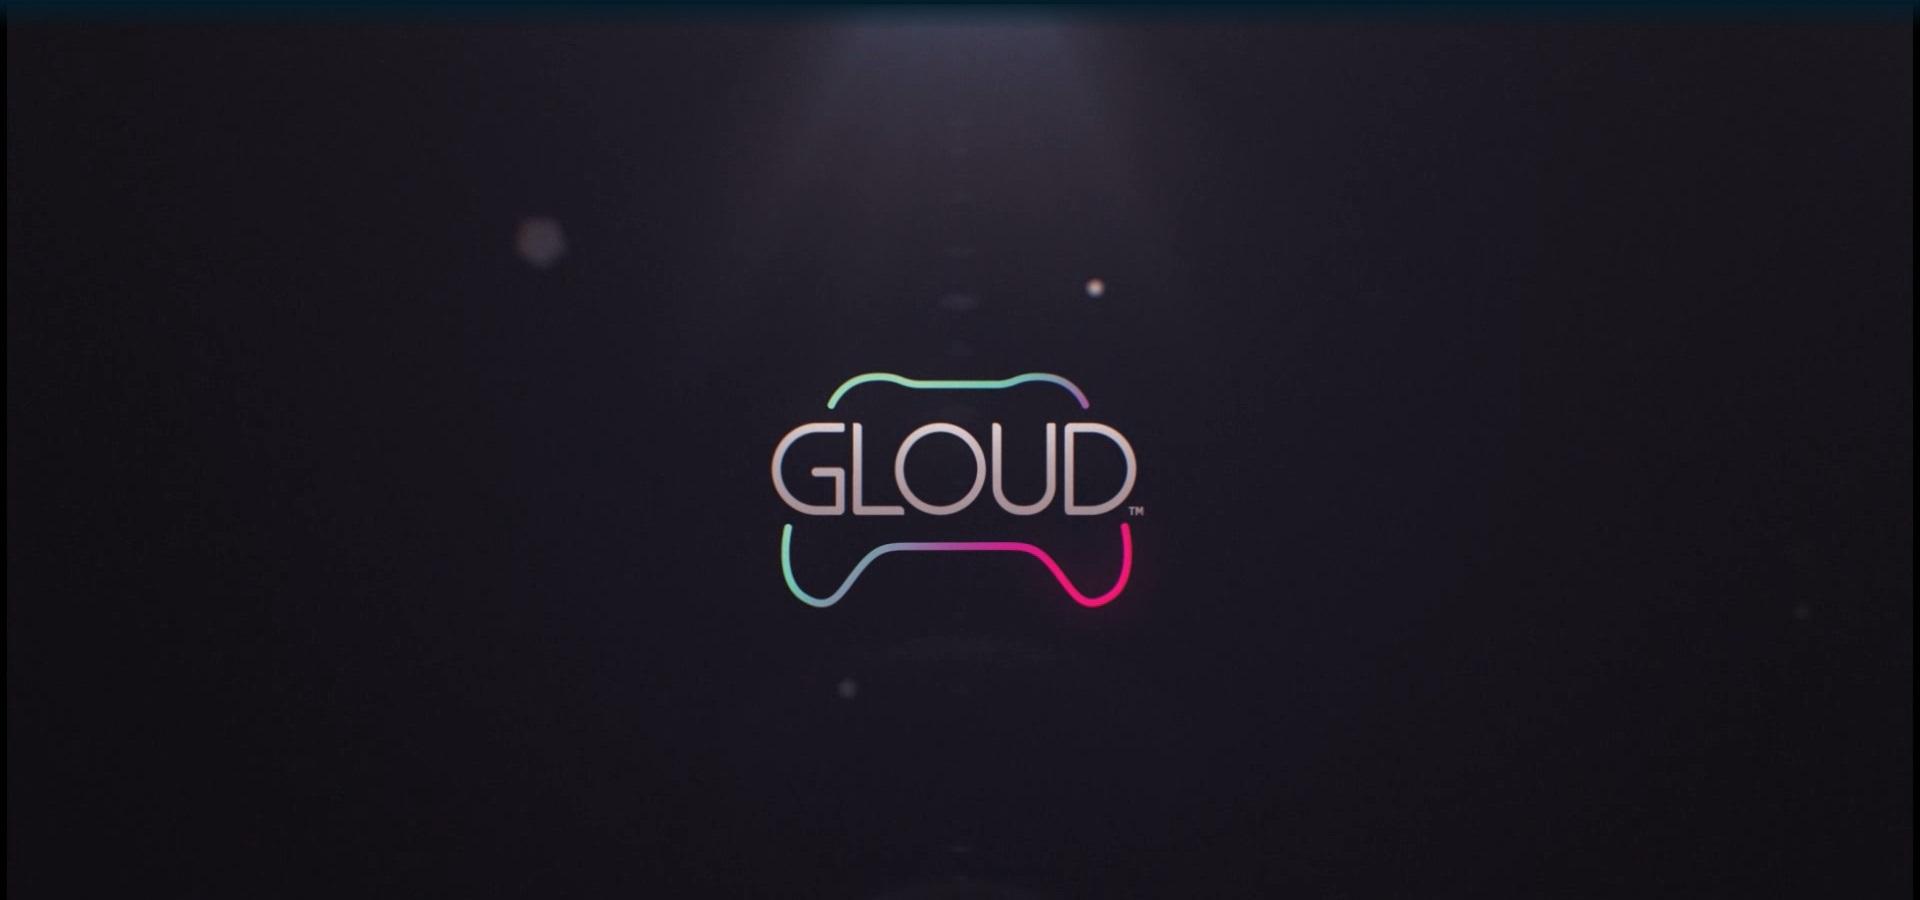 Ganadores tres meses de Gloud [SORTEO]